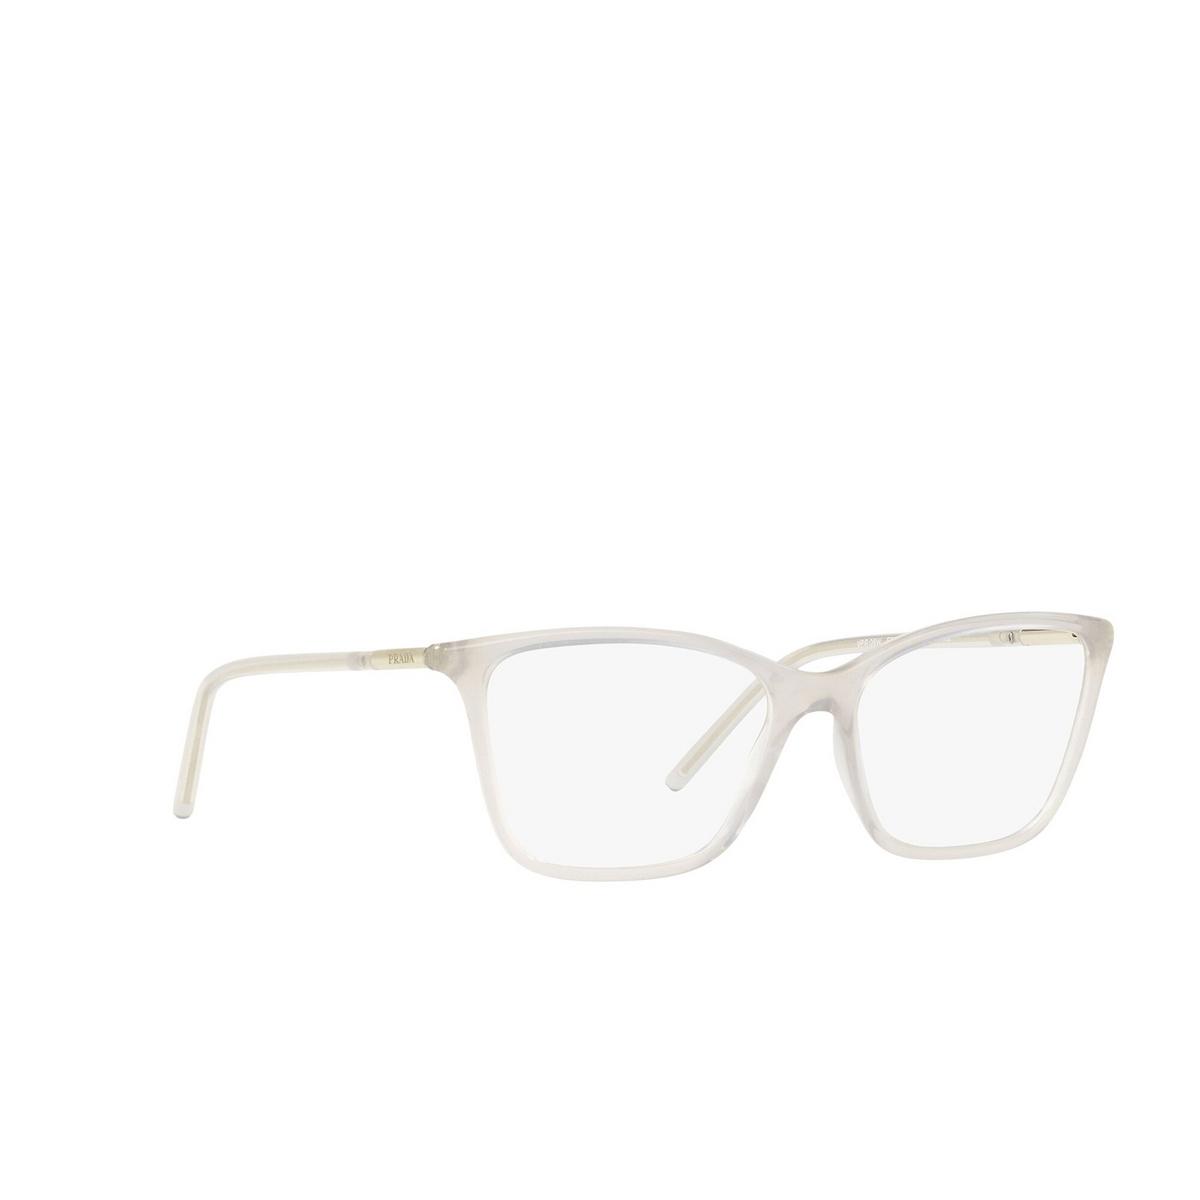 Prada® Cat-eye Eyeglasses: PR 08WV color Opal Grey TWH1O1 - three-quarters view.